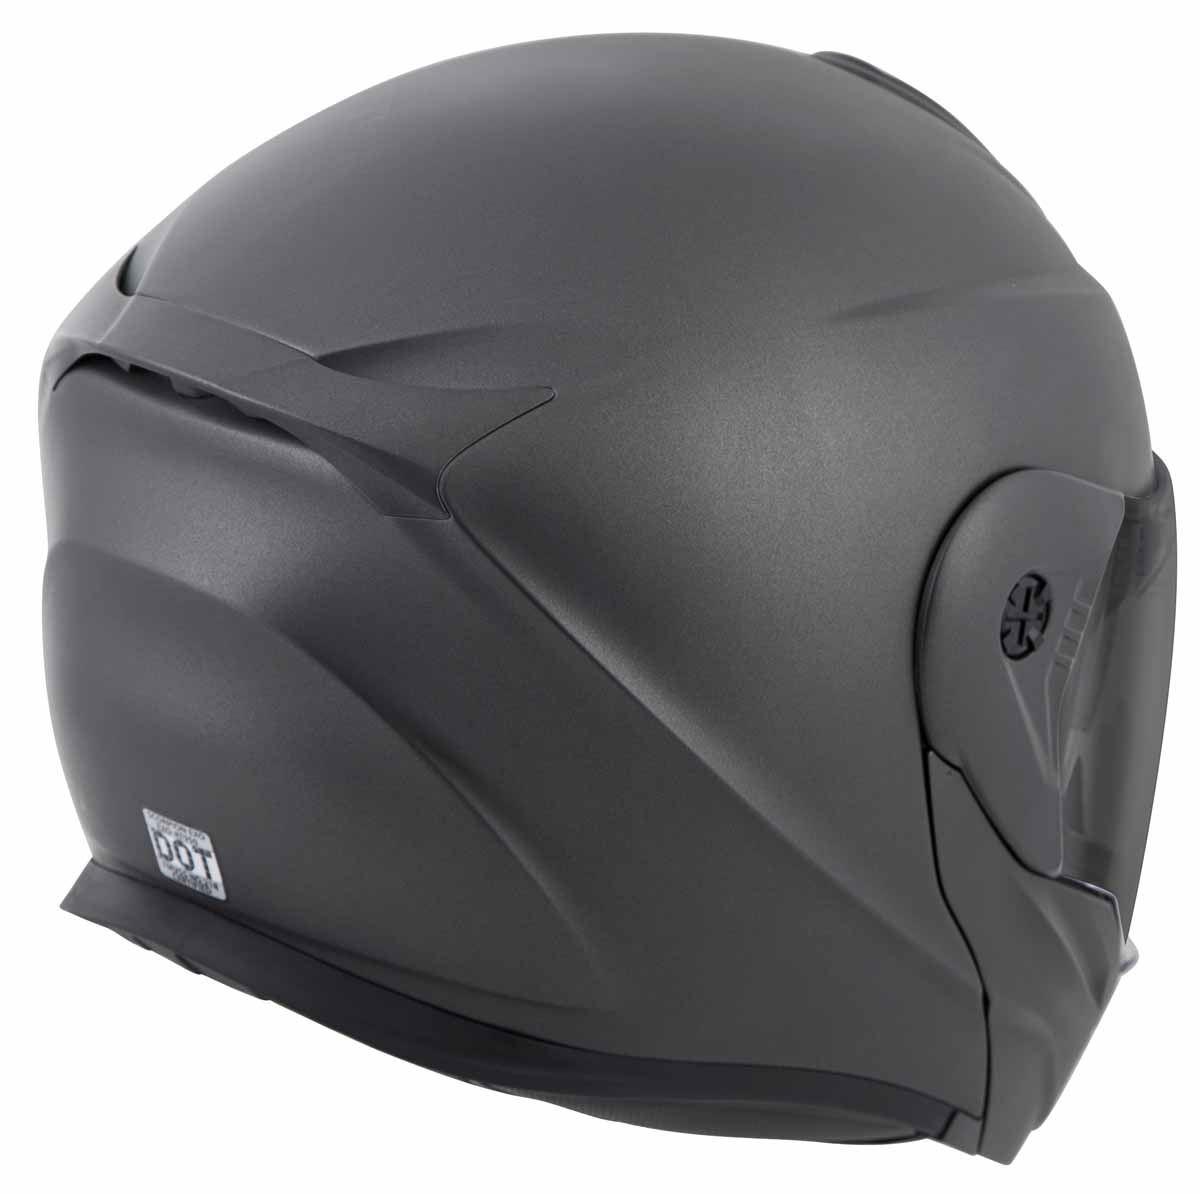 Scorpion-EXO-AT950-Helmet-Flip-Up-Modular-Dual-Sport-Adventure-ADV-DOT-XS-3XL miniature 27